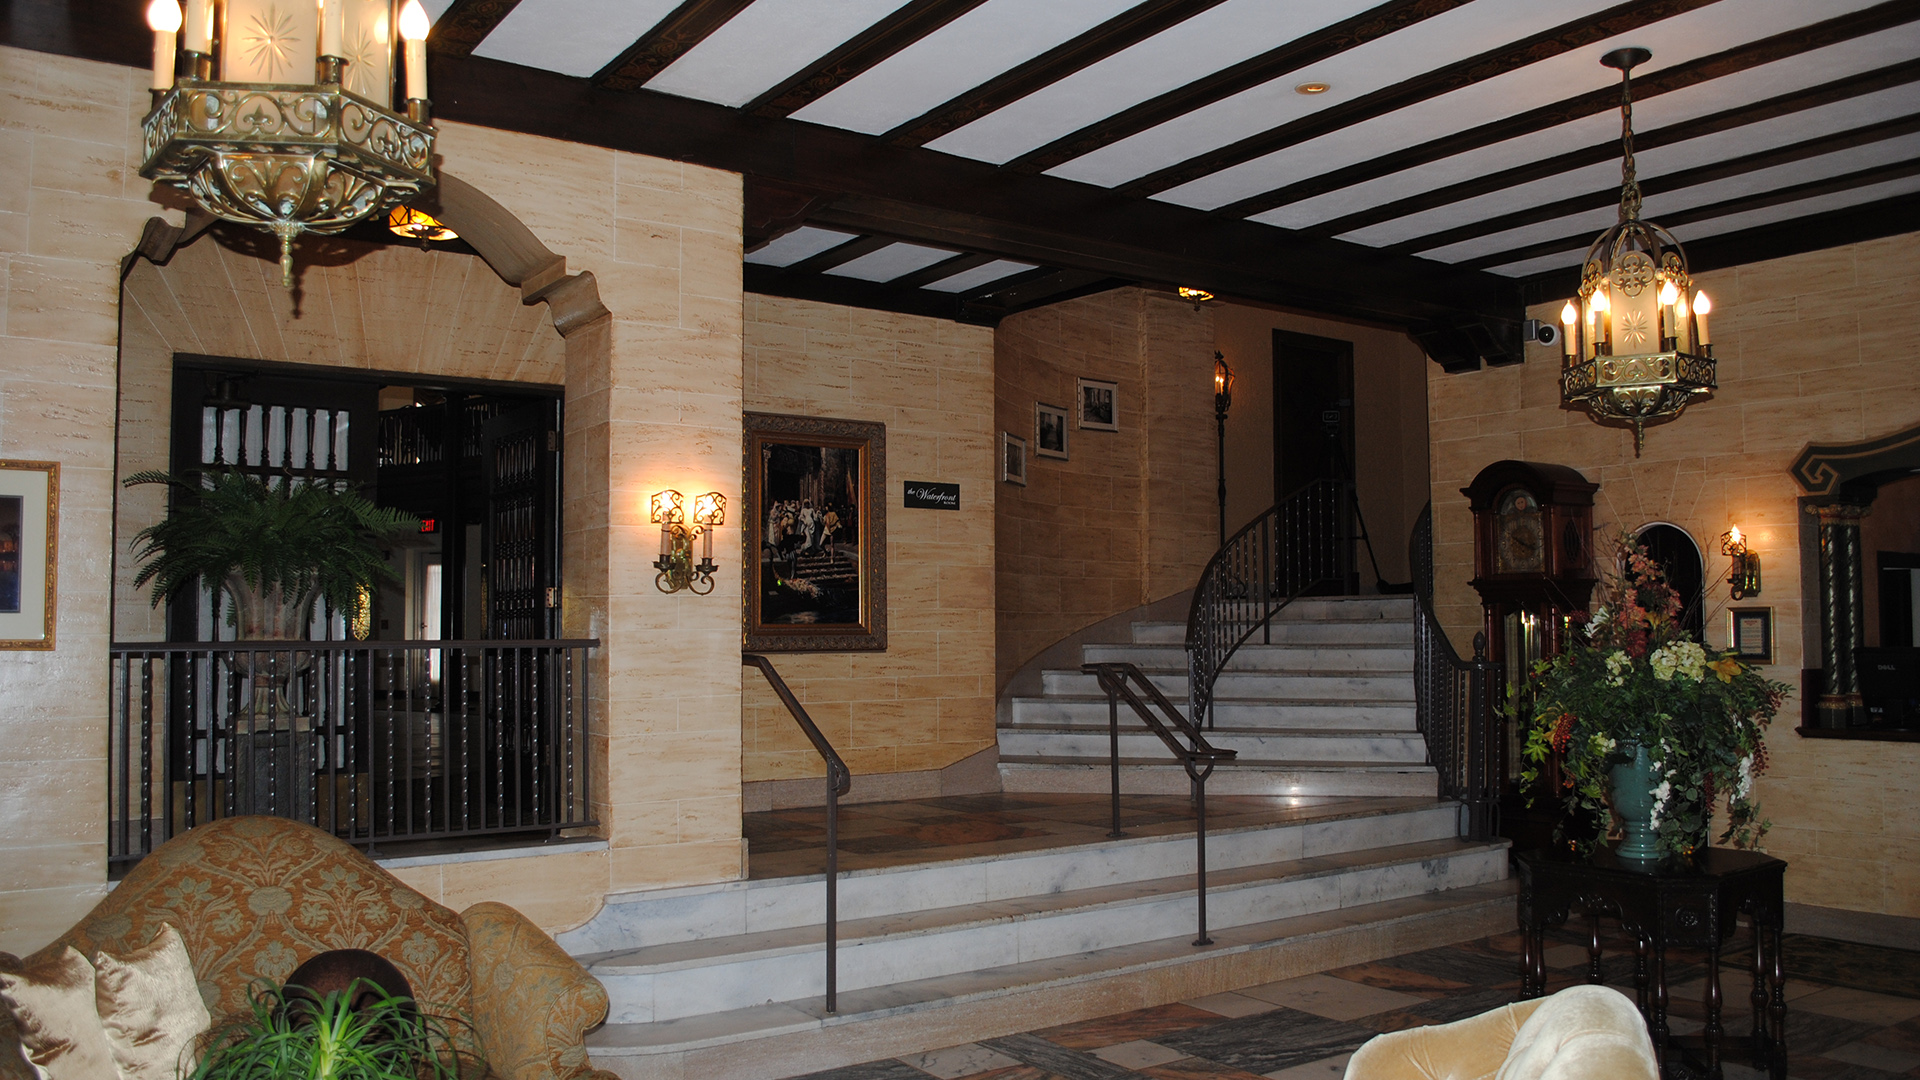 hotels bestwesternlincolninn luxury best index restaurant global il in inn view hotel private club lincoln western